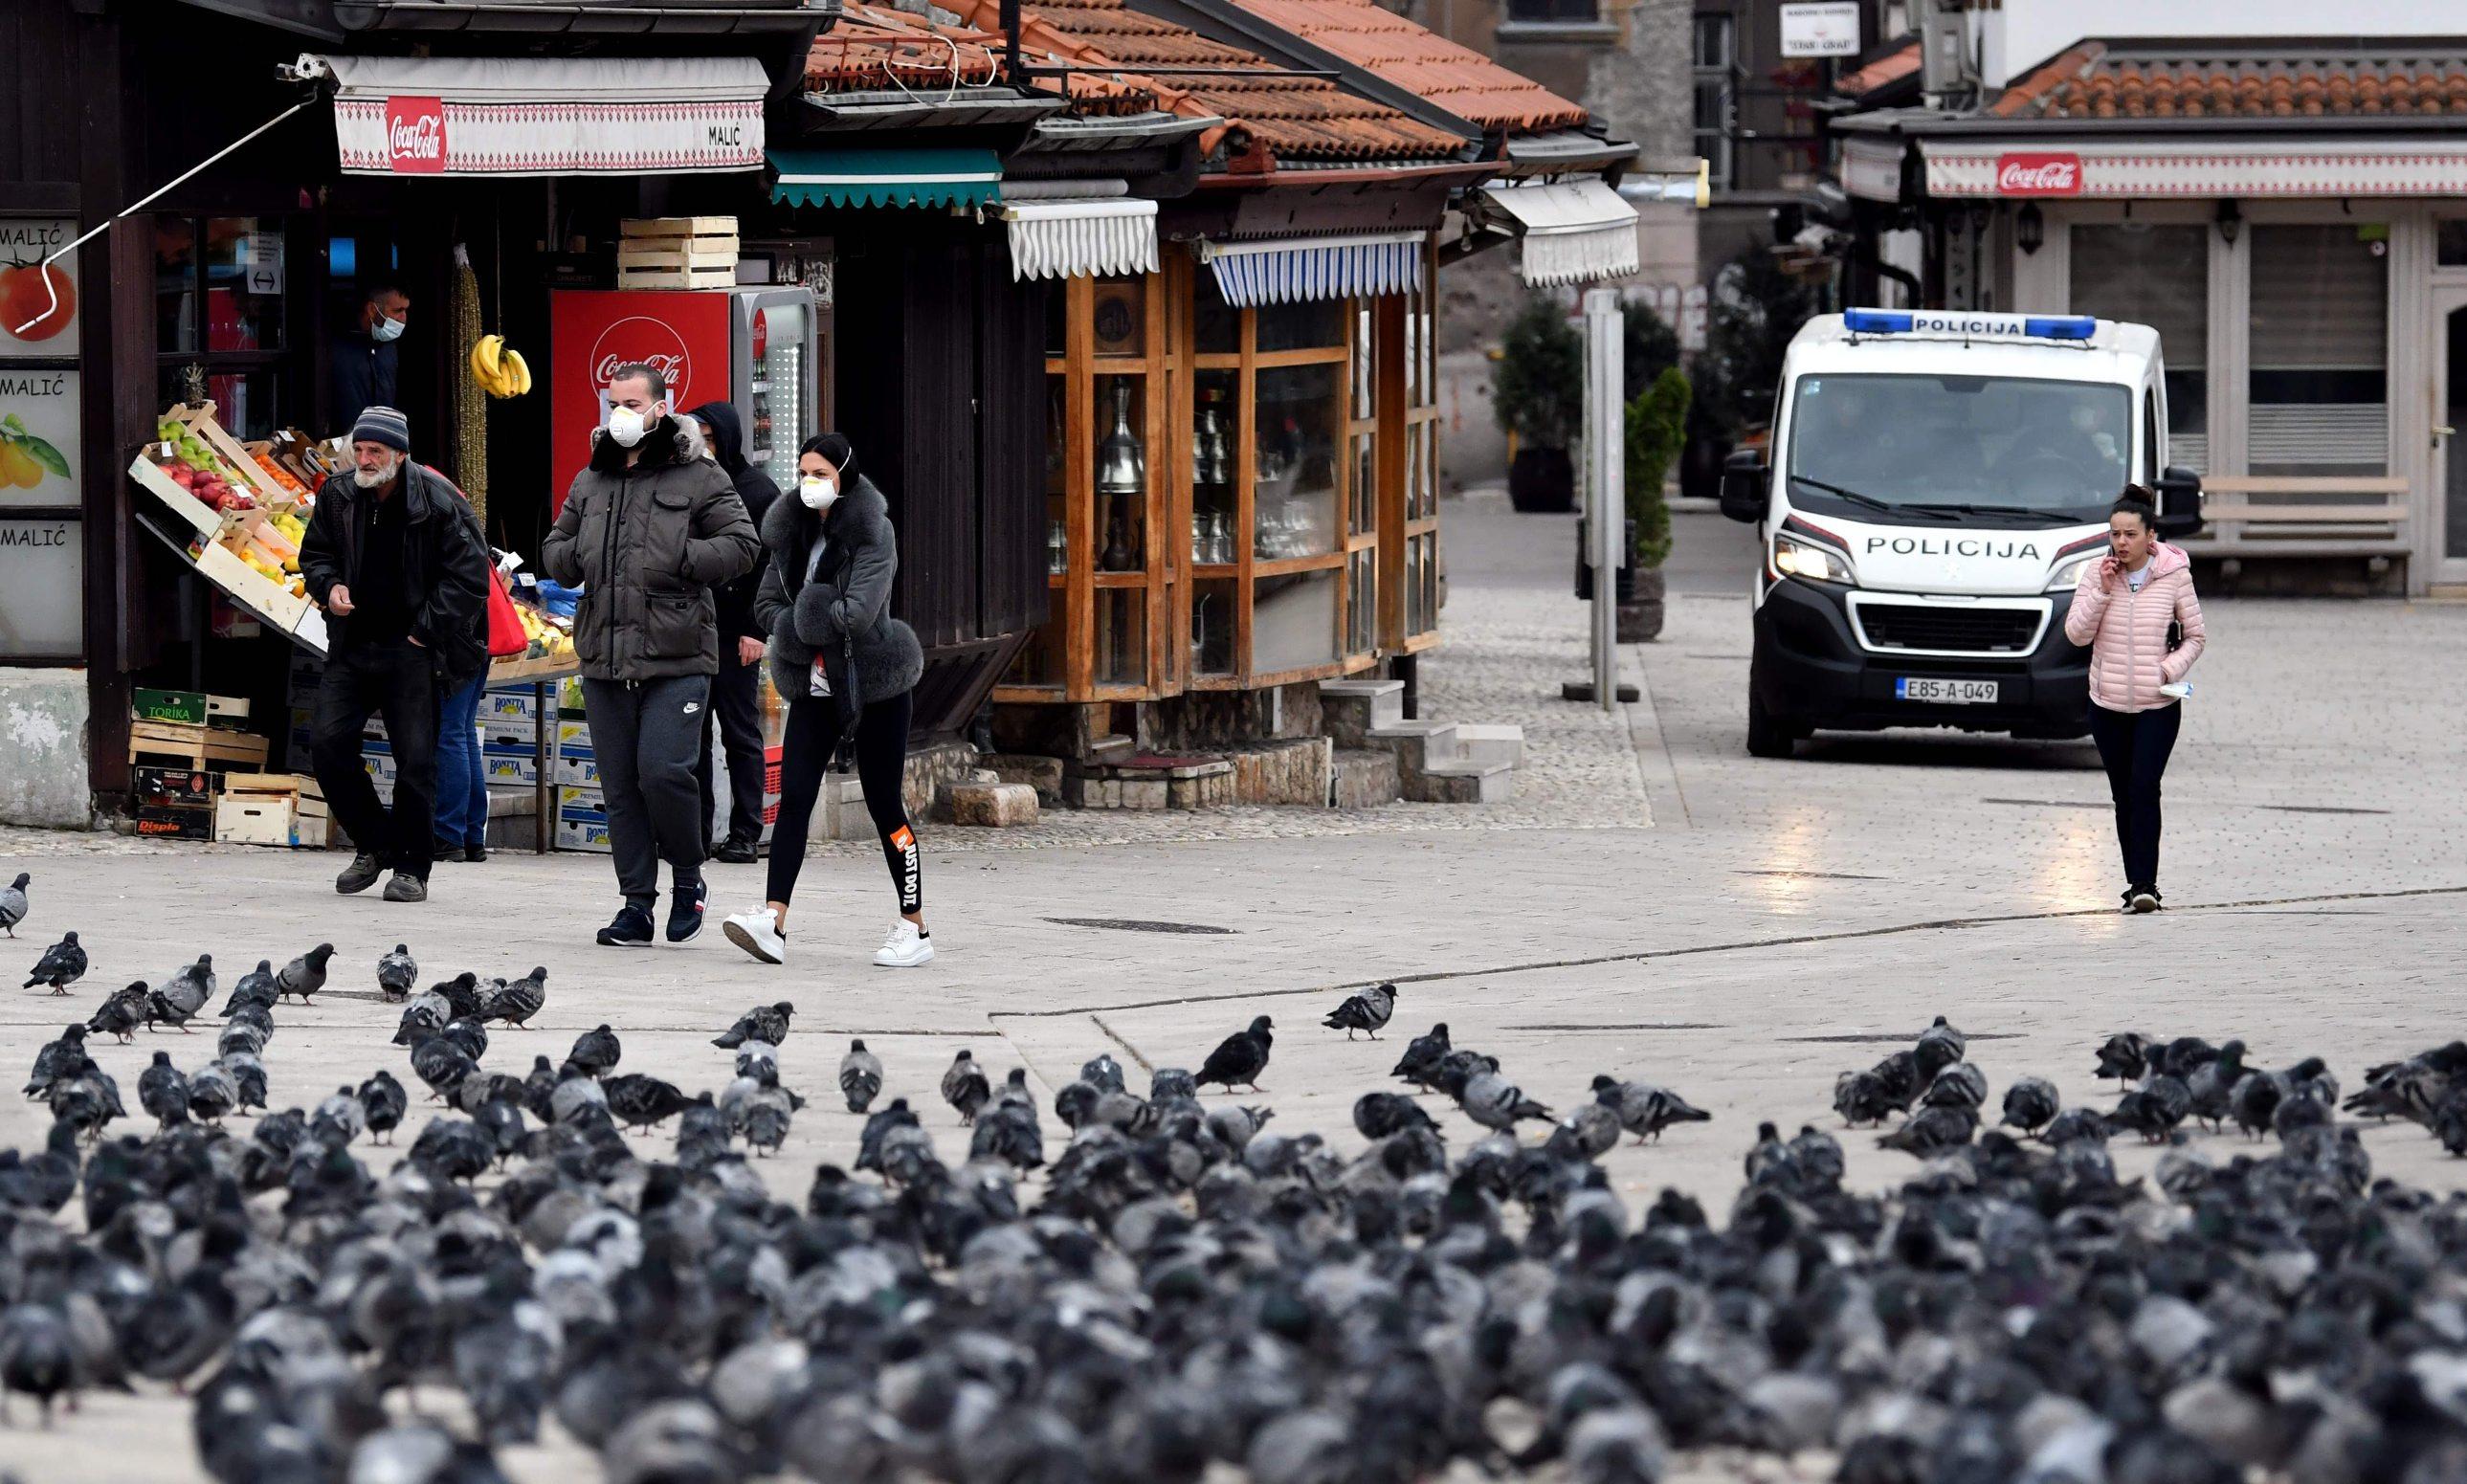 AFP_1Q34U1